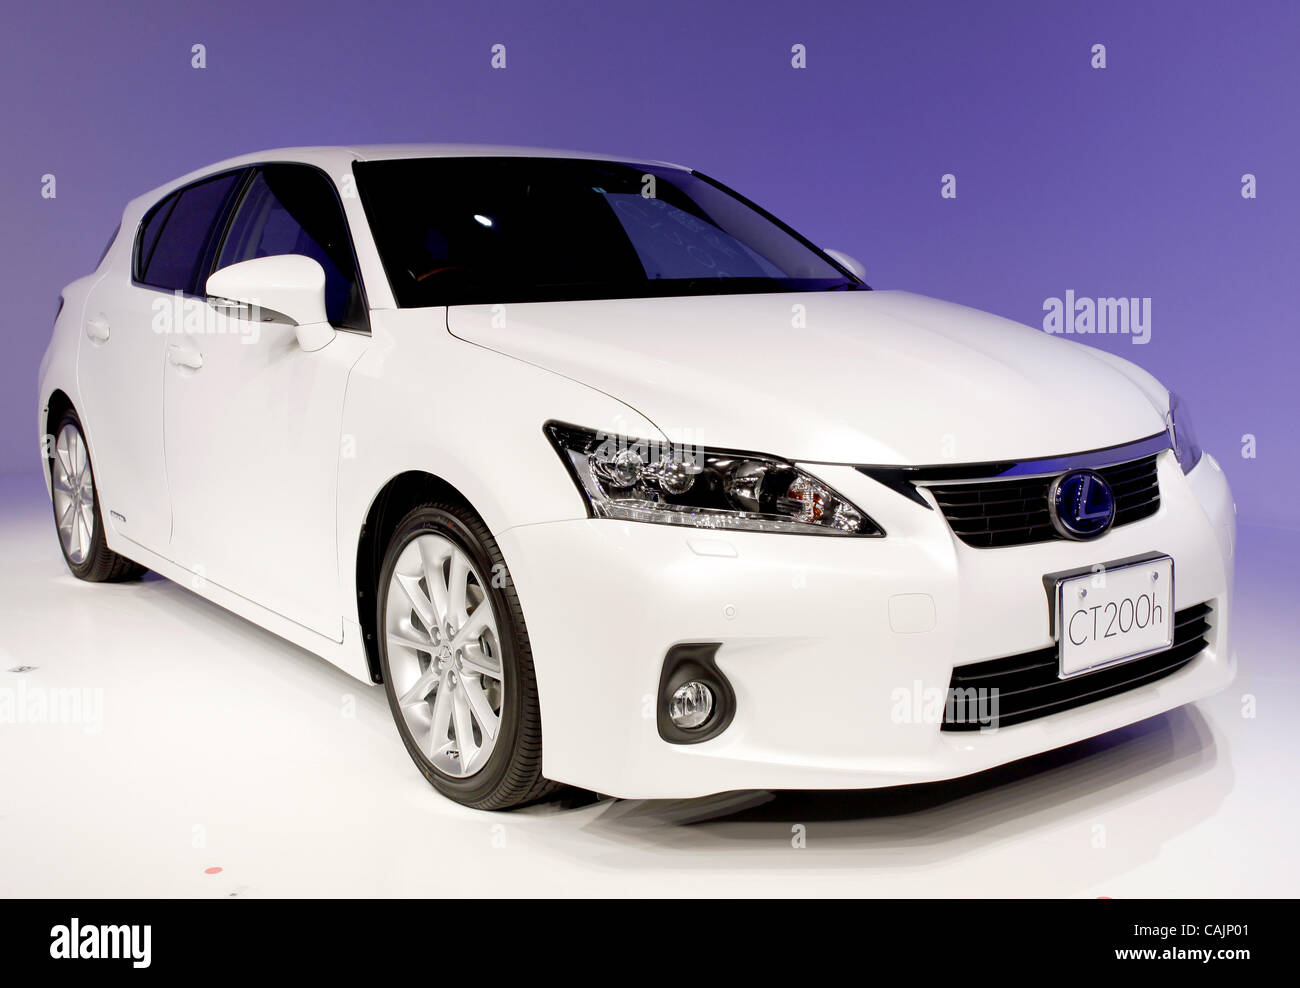 Jan. 12, 2011 - Tokyo, Japan - TOYOTA Motor Corporation's newly introduced car ''LEXUS CT200h'' - Stock Image